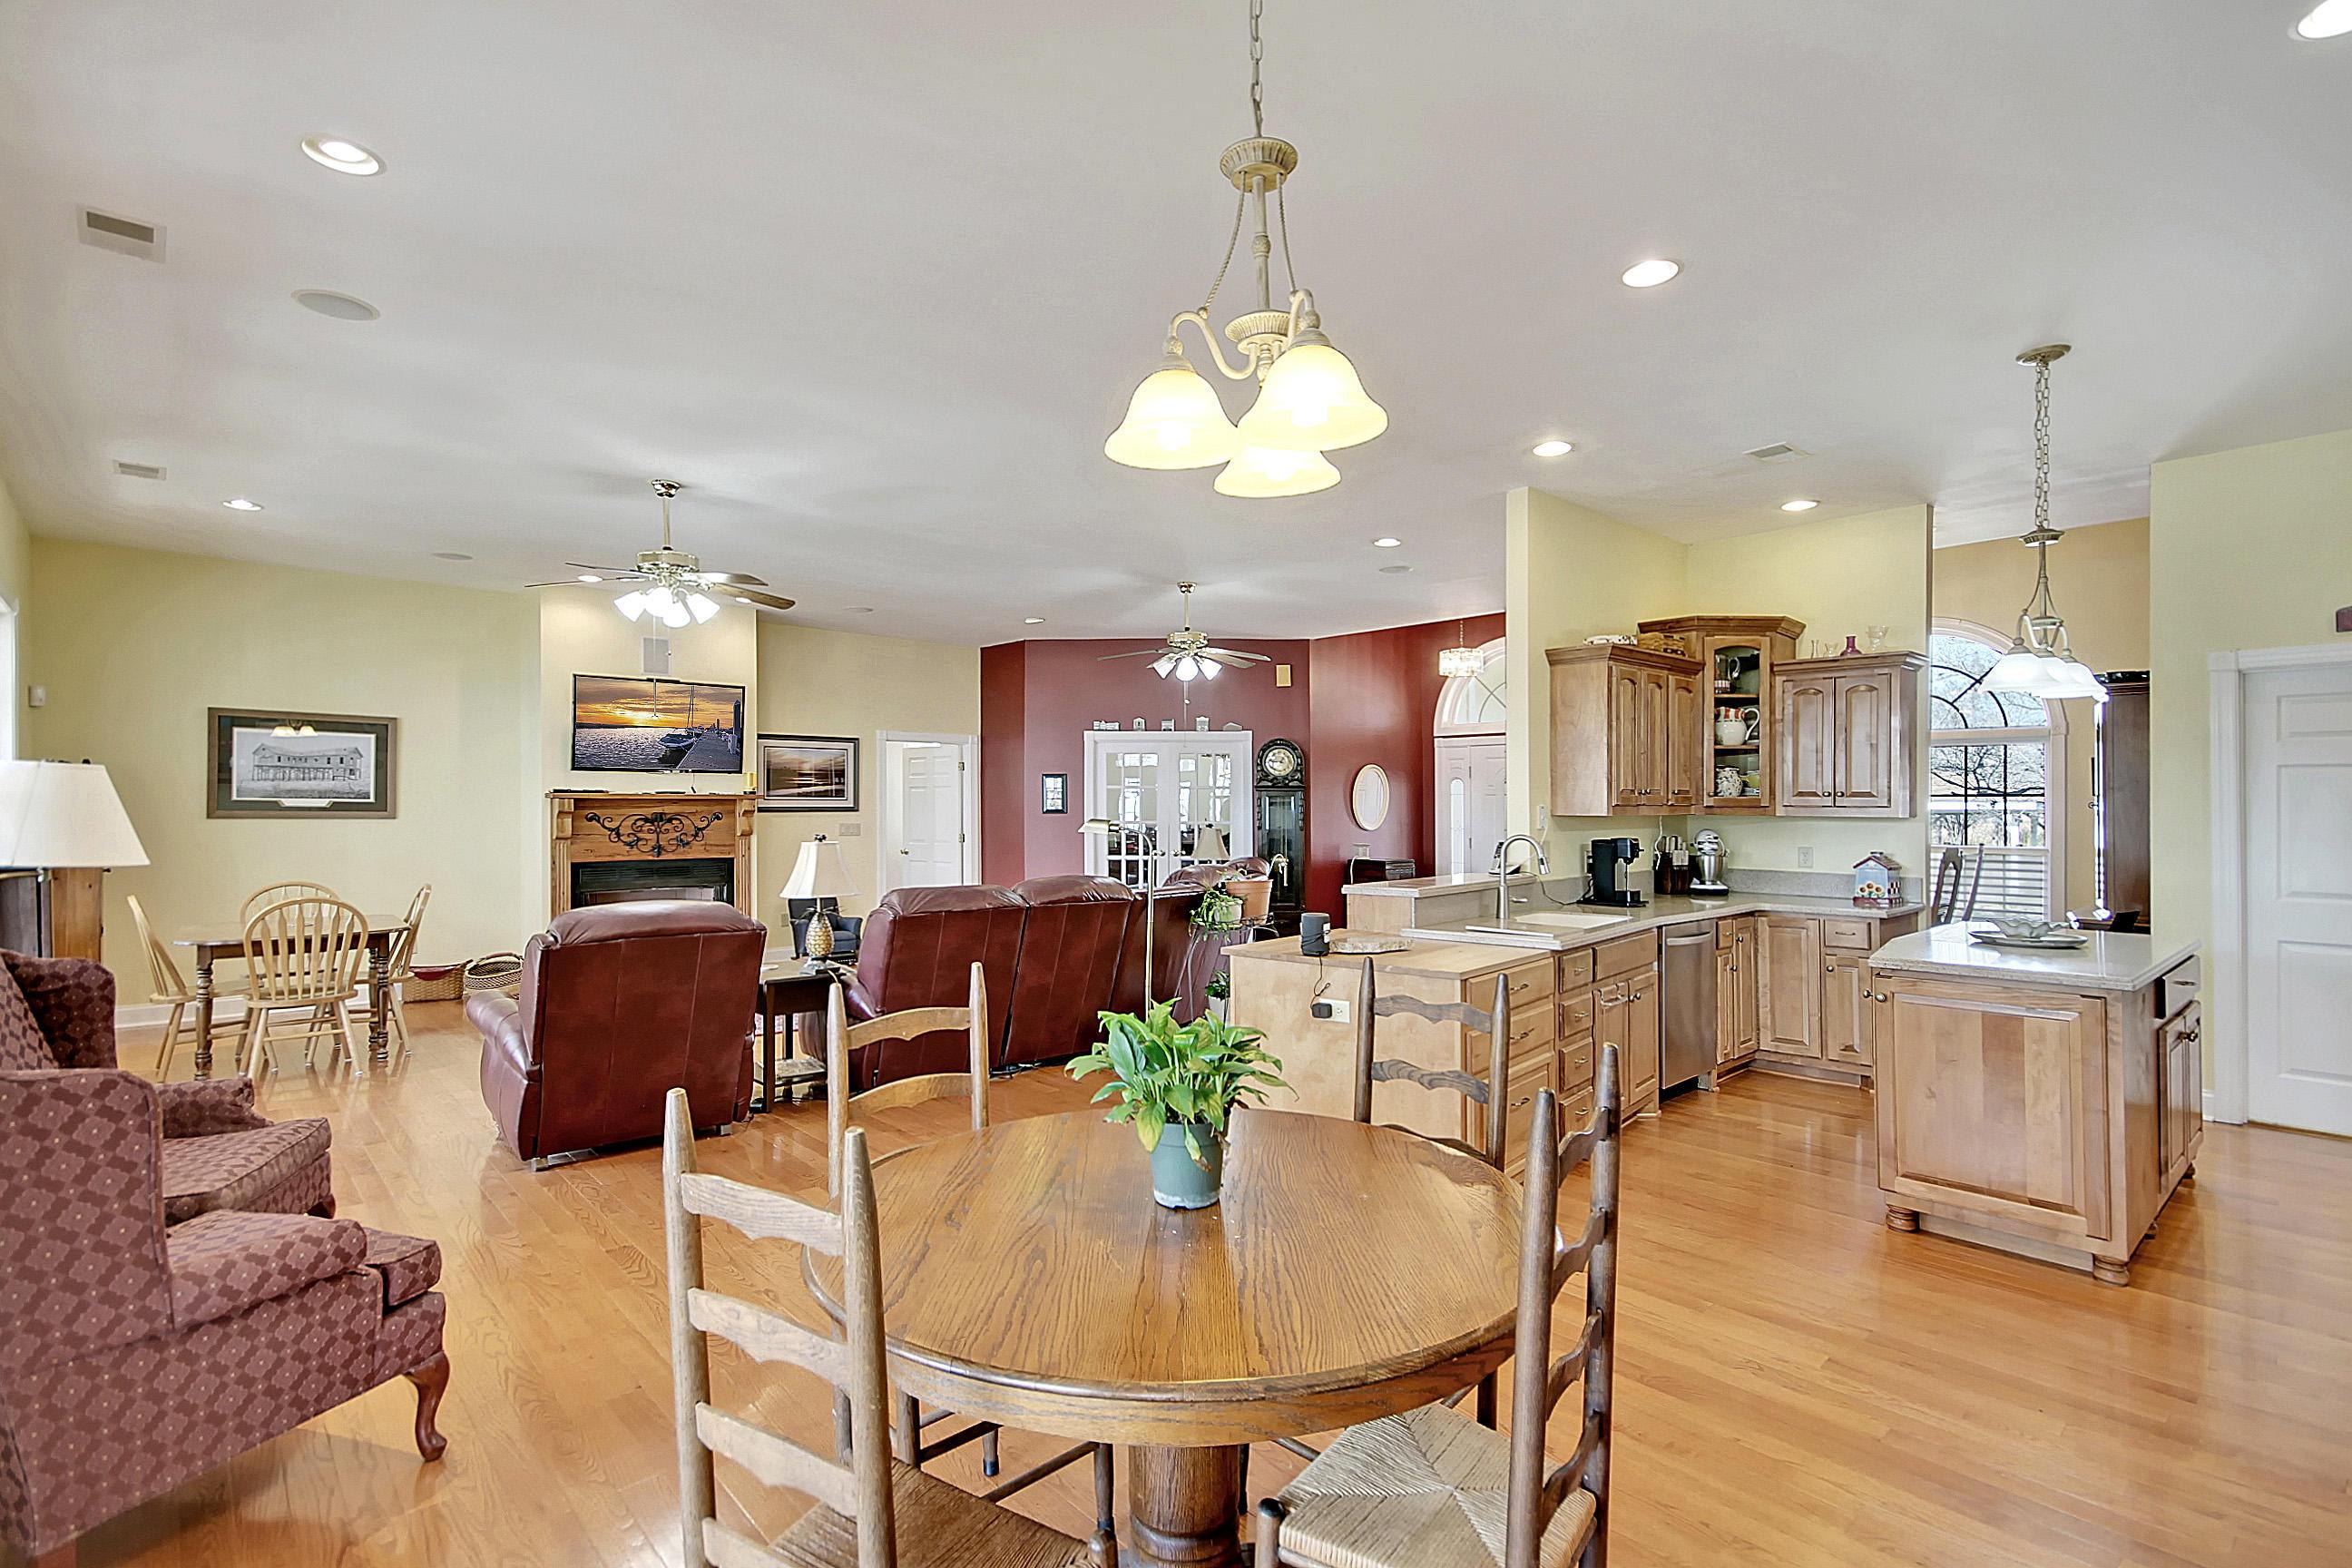 Cross Subd (Longpoint) Homes For Sale - 1191 Longpoint, Cross, SC - 13